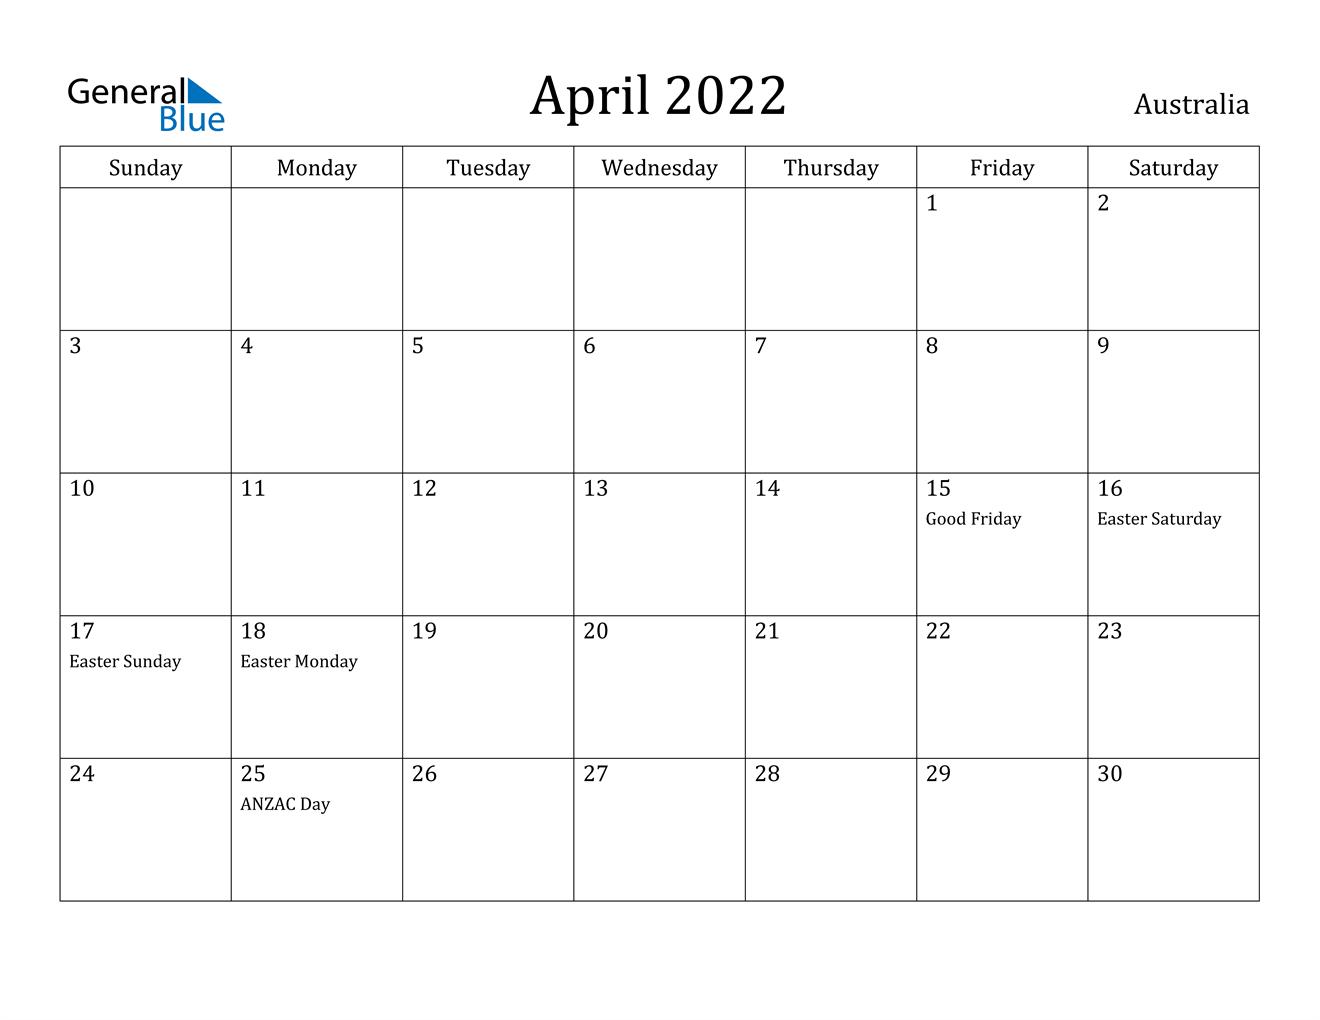 April 2021 To March 2022 Calendar April 2021 Calendar Hd Wallpapers Free Download Calendar View Or Print The Online 2022 Calendar